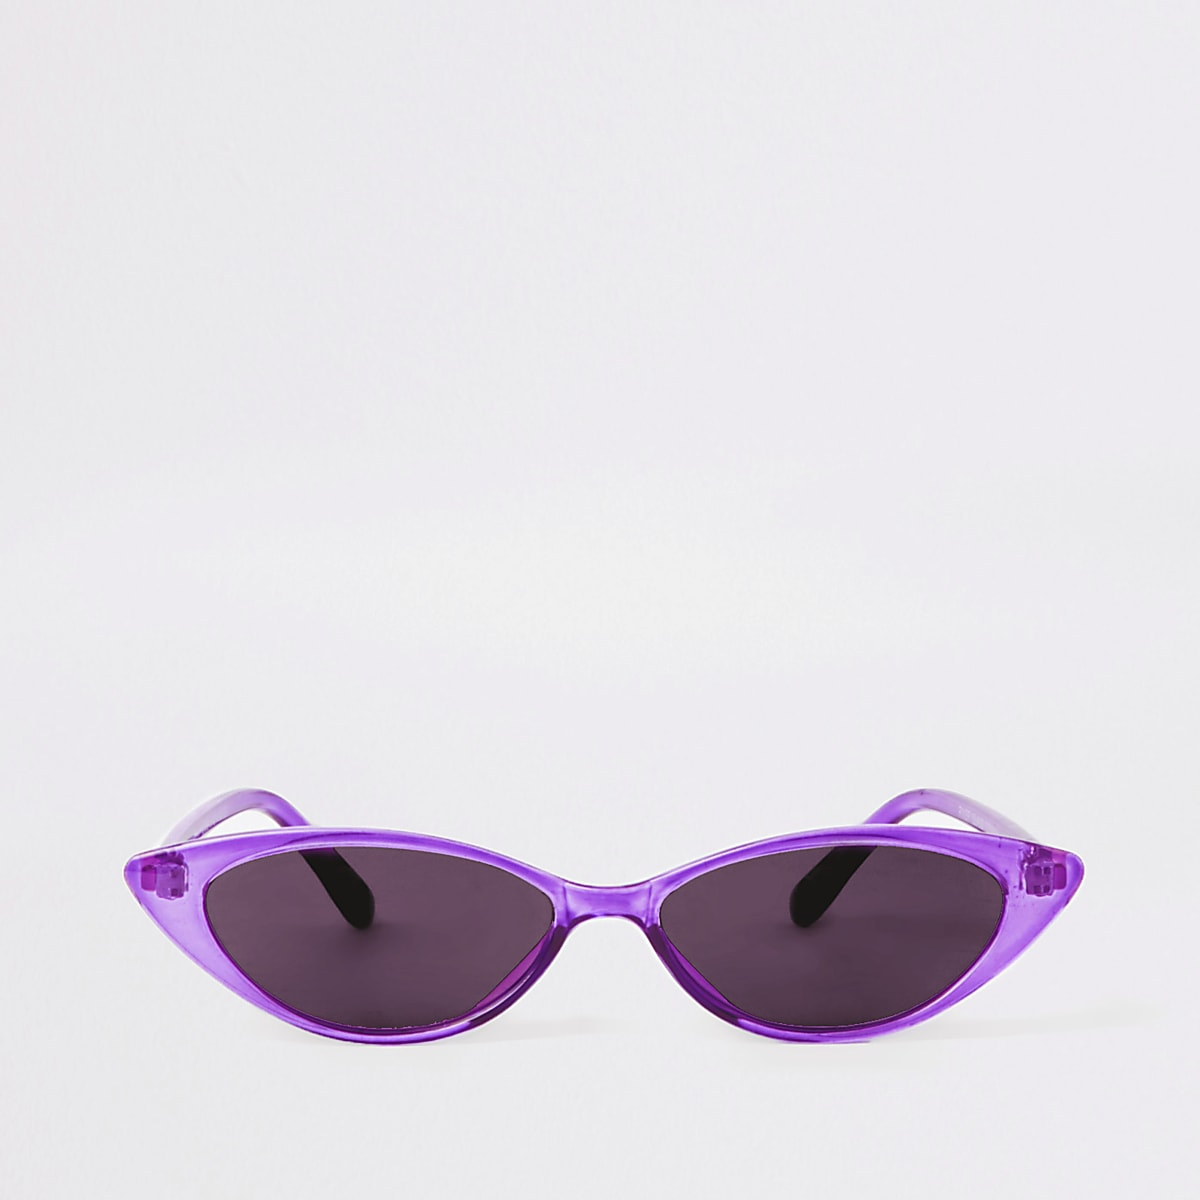 Purple slim cat eye sunglasses